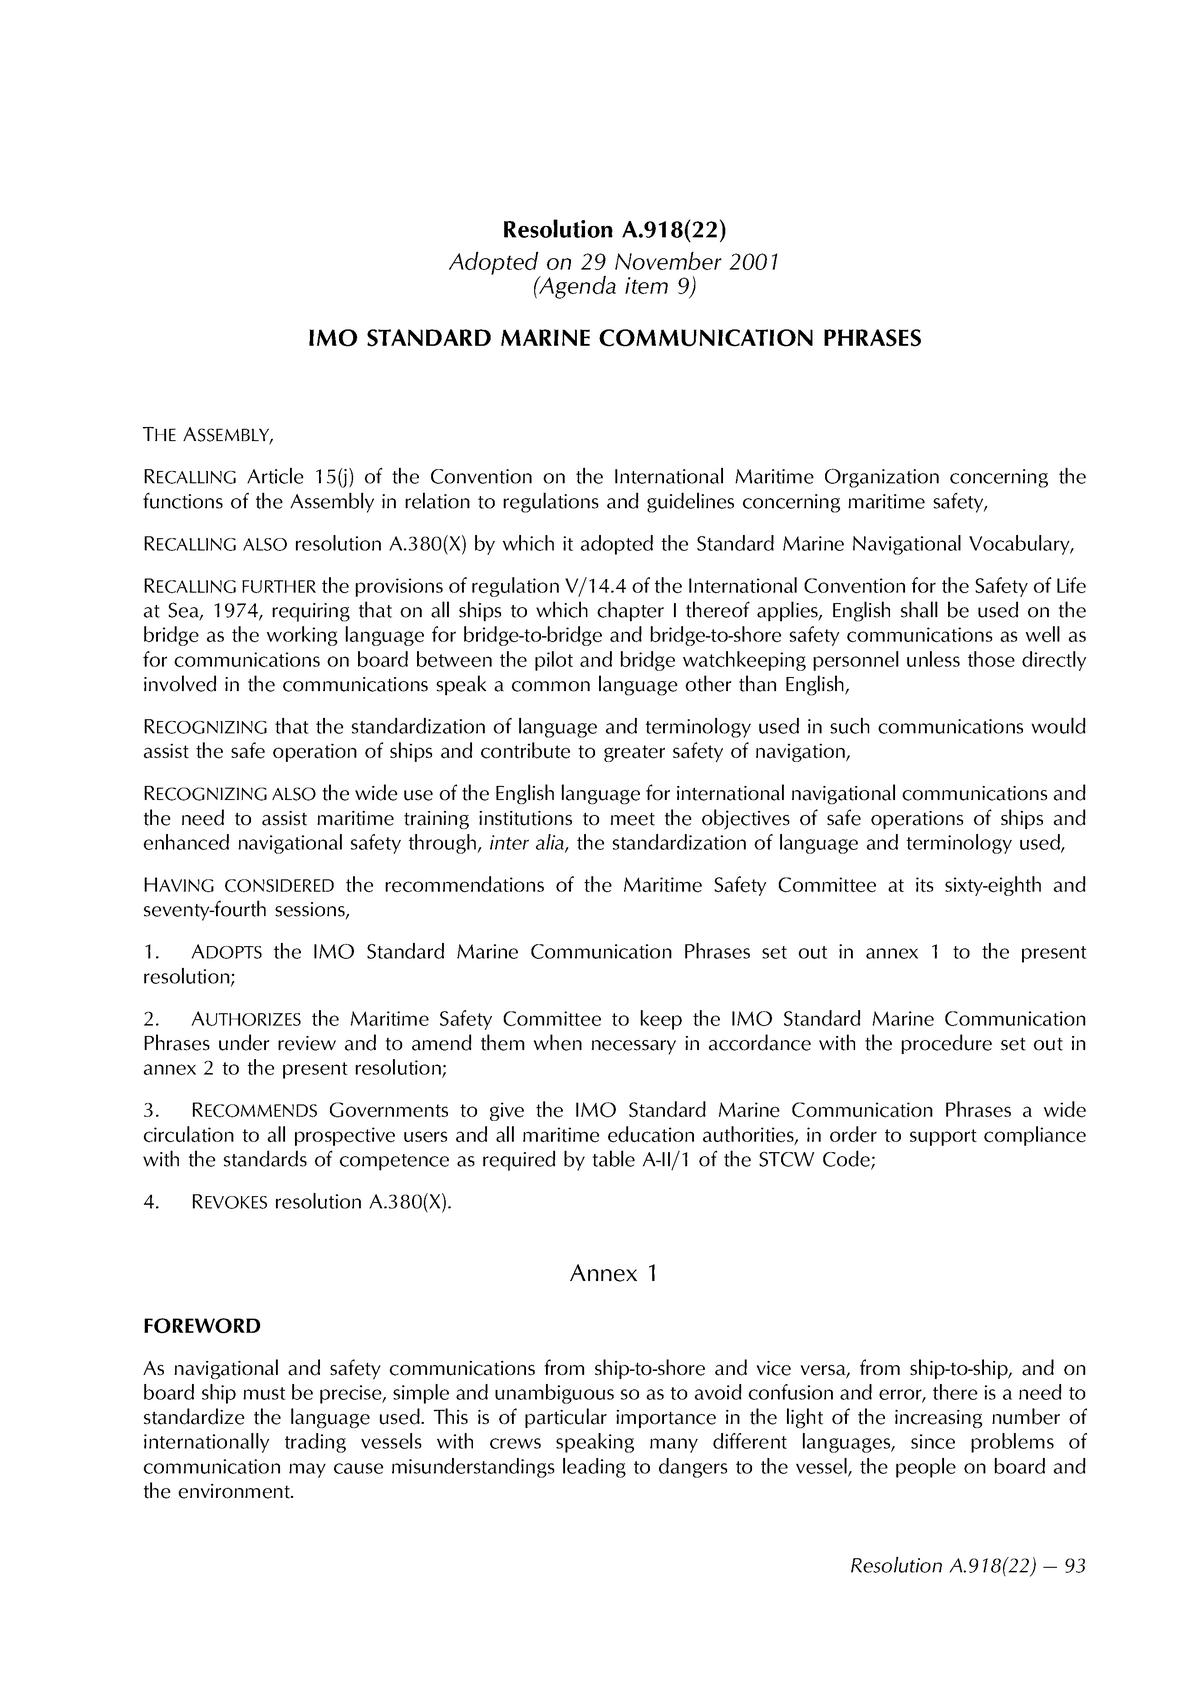 IMO Standard Marine Communication Phrases - Communicatie